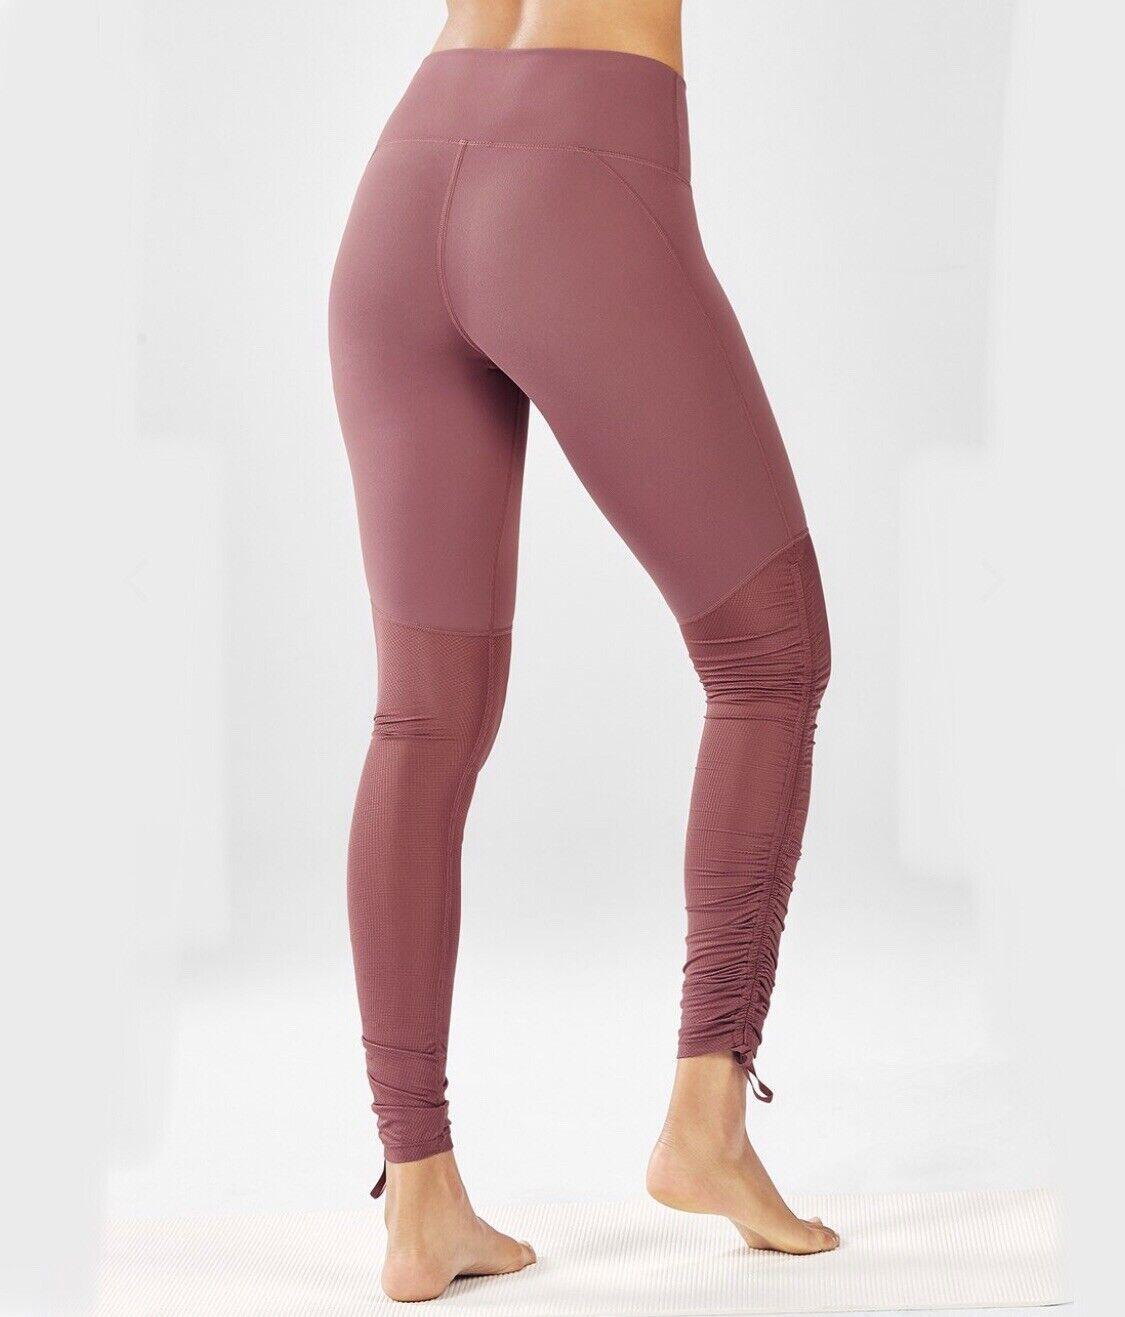 Fabletics Cashel Umschlag Pureluxe Leggings XS Pink Rouge Geschnürt Rüschen Hose